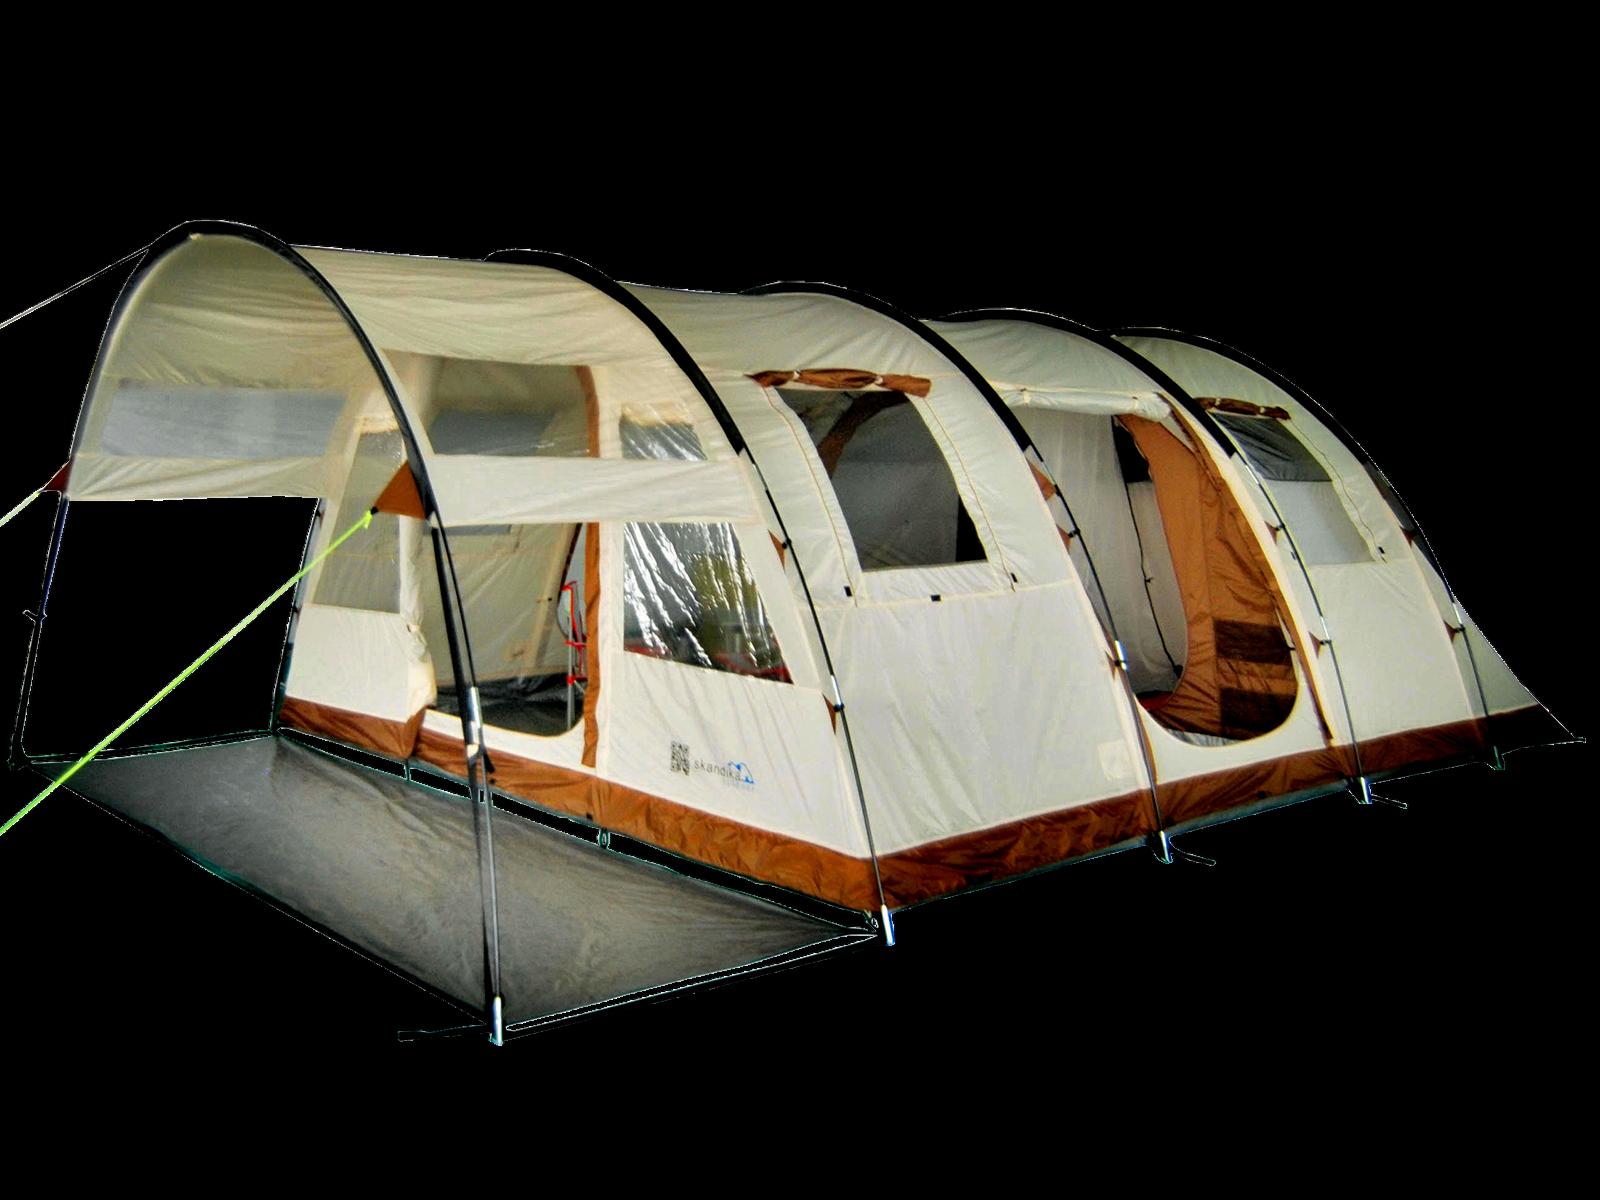 Skanika outdoor ~ 6 Personen Zelt ~ Modell Kairo ~1x genutzt